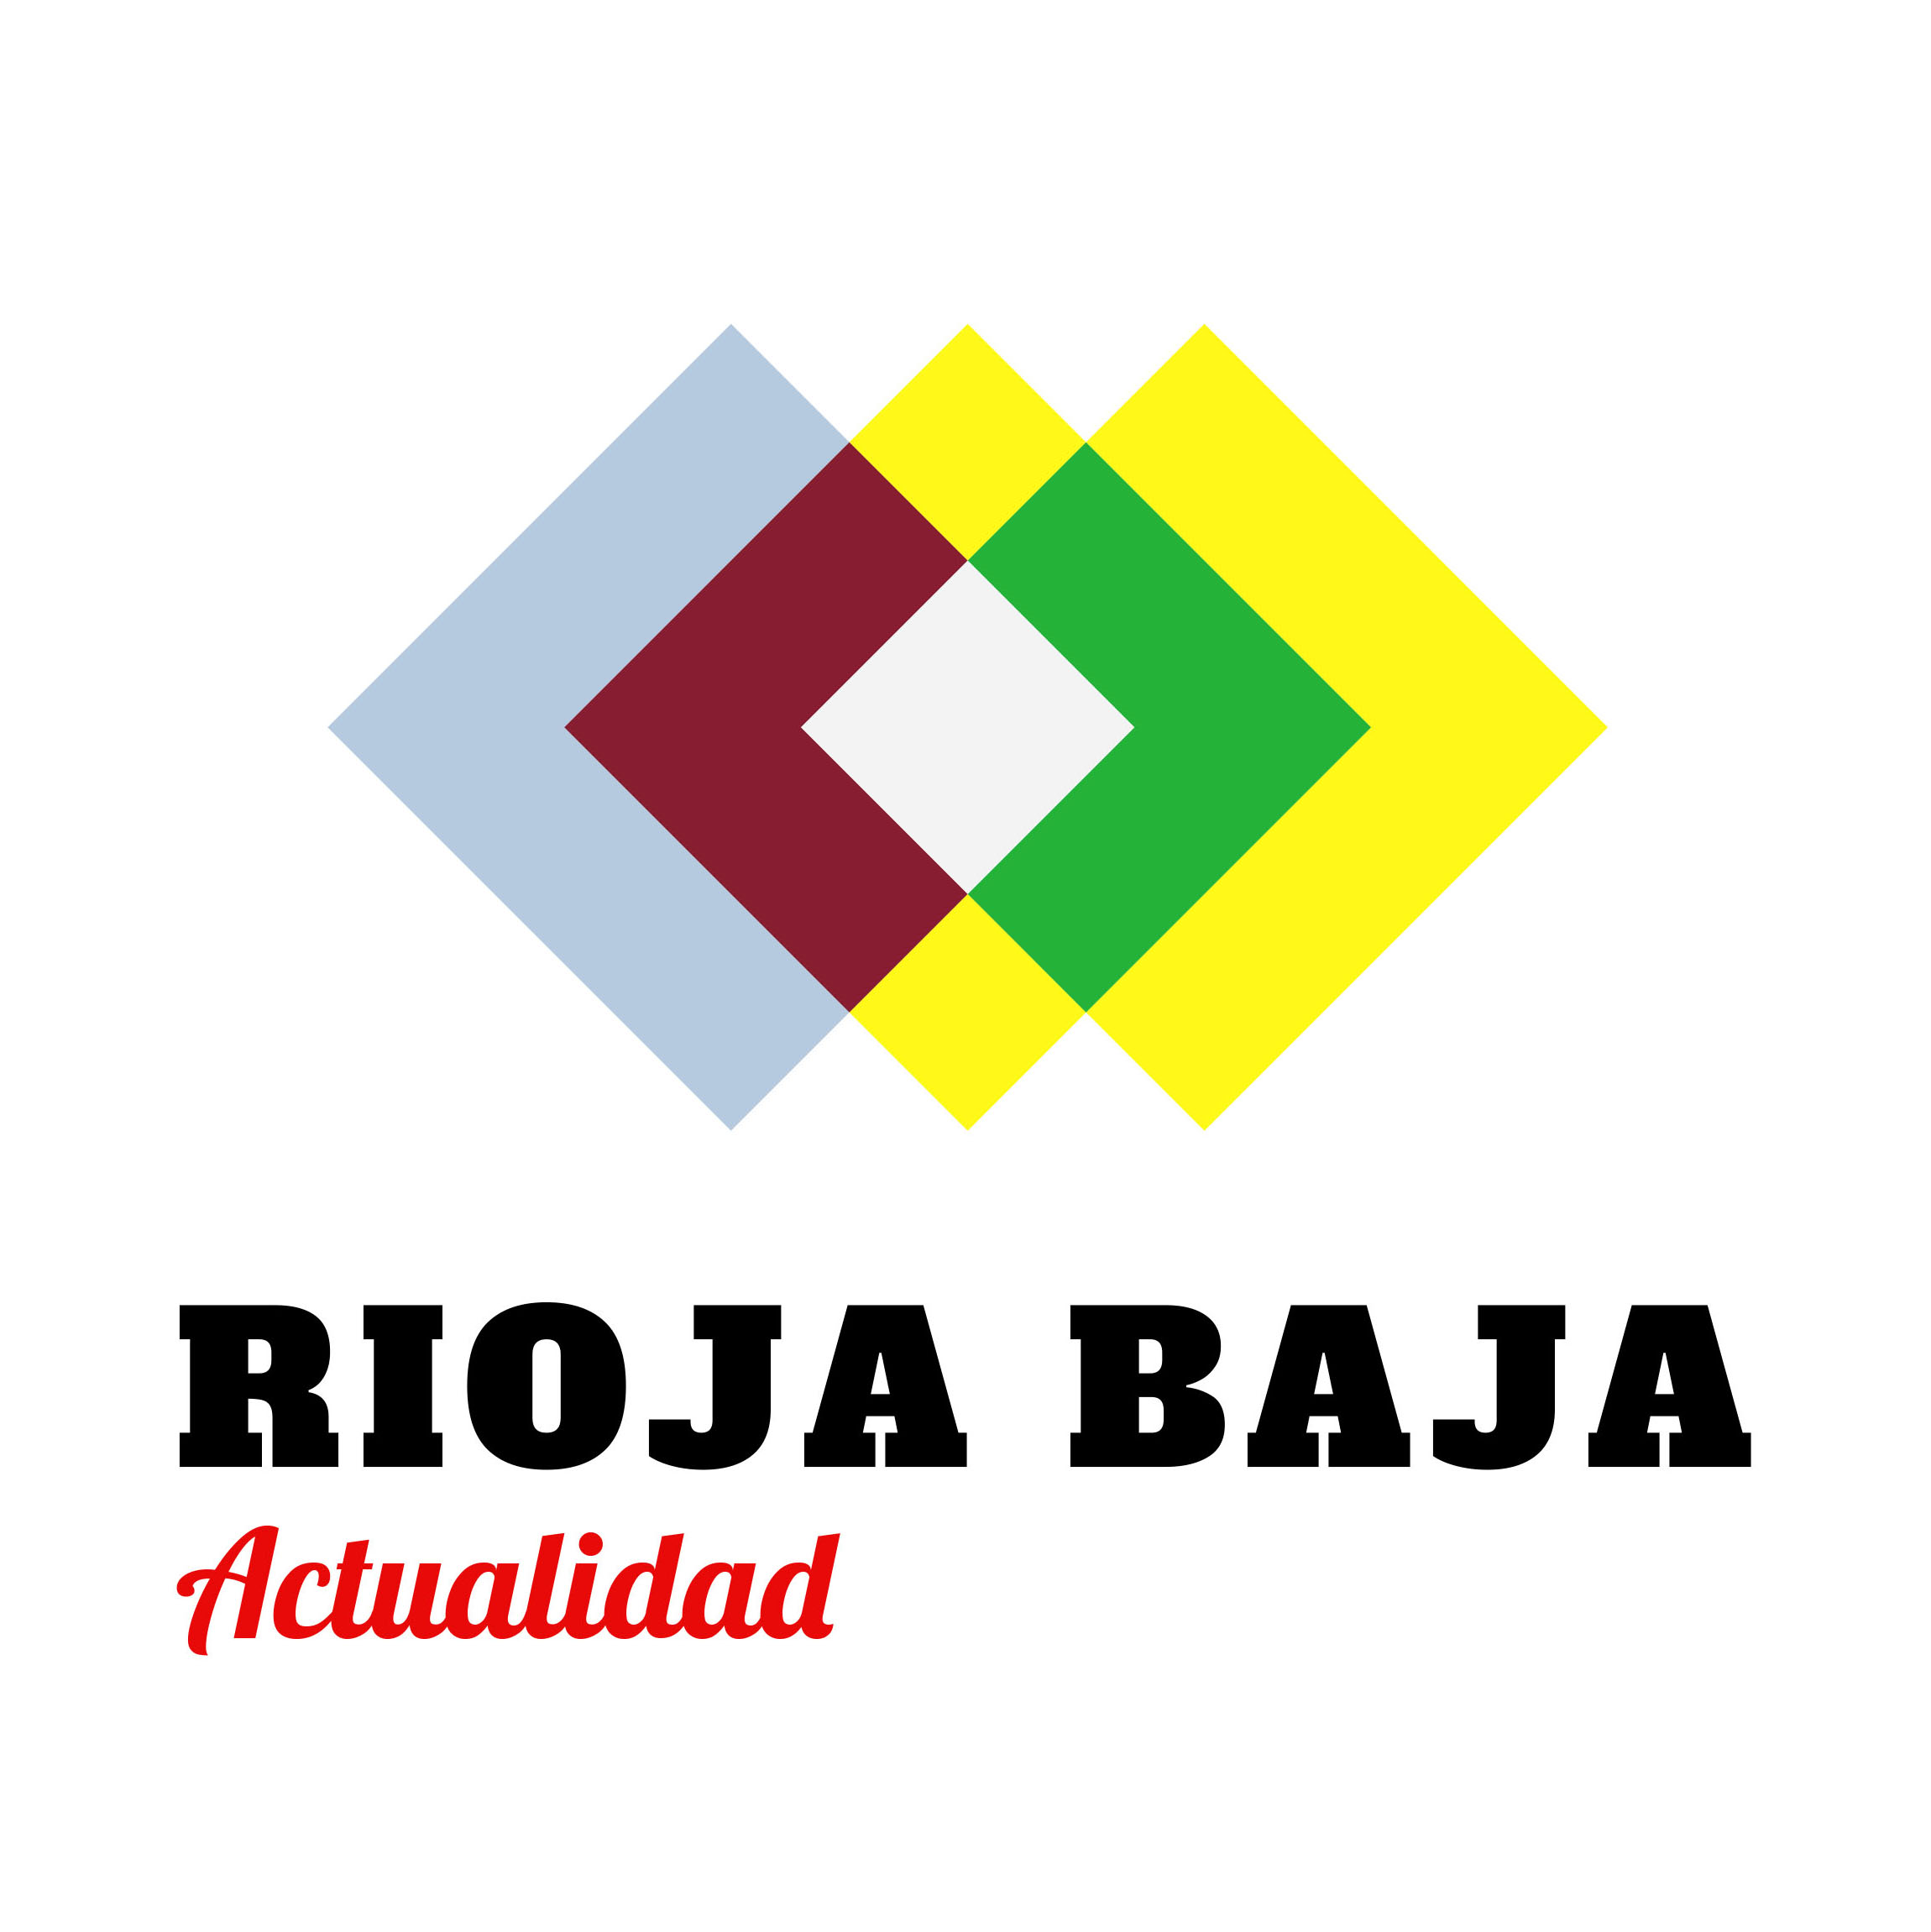 Actualidad Rioja Baja